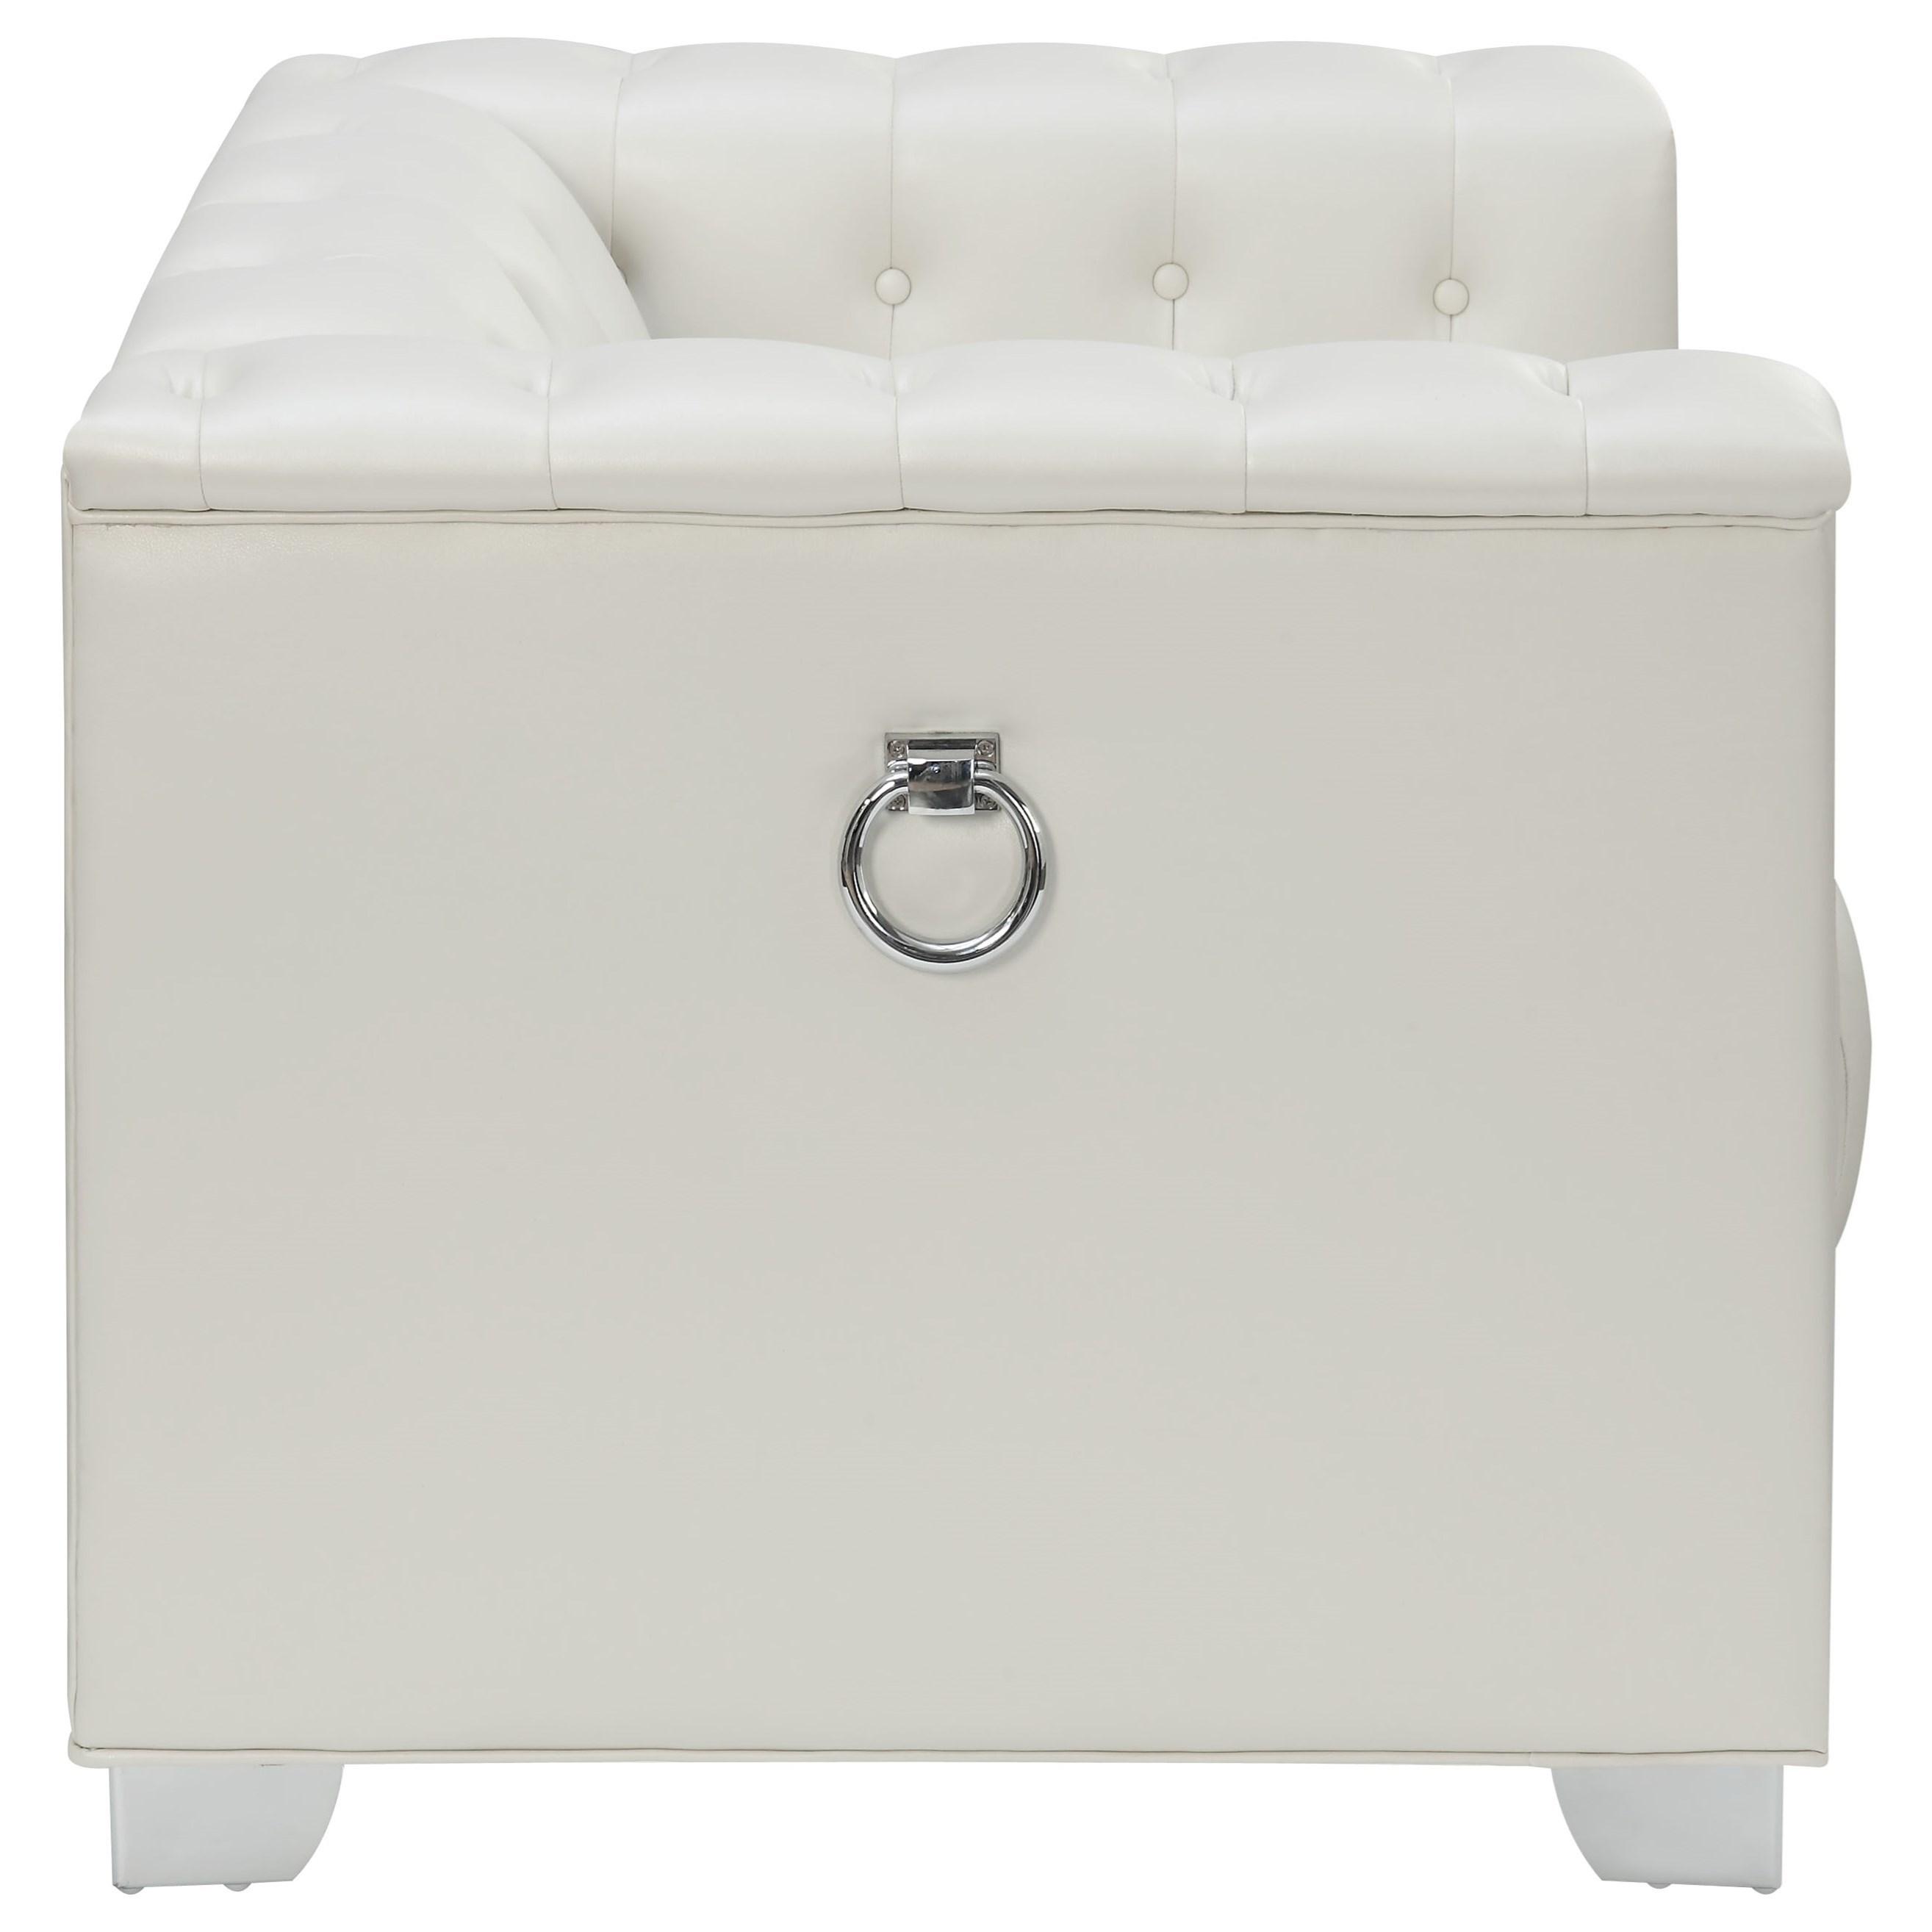 Coaster Chaviano 505393 Low Profile Pearl White Tufted